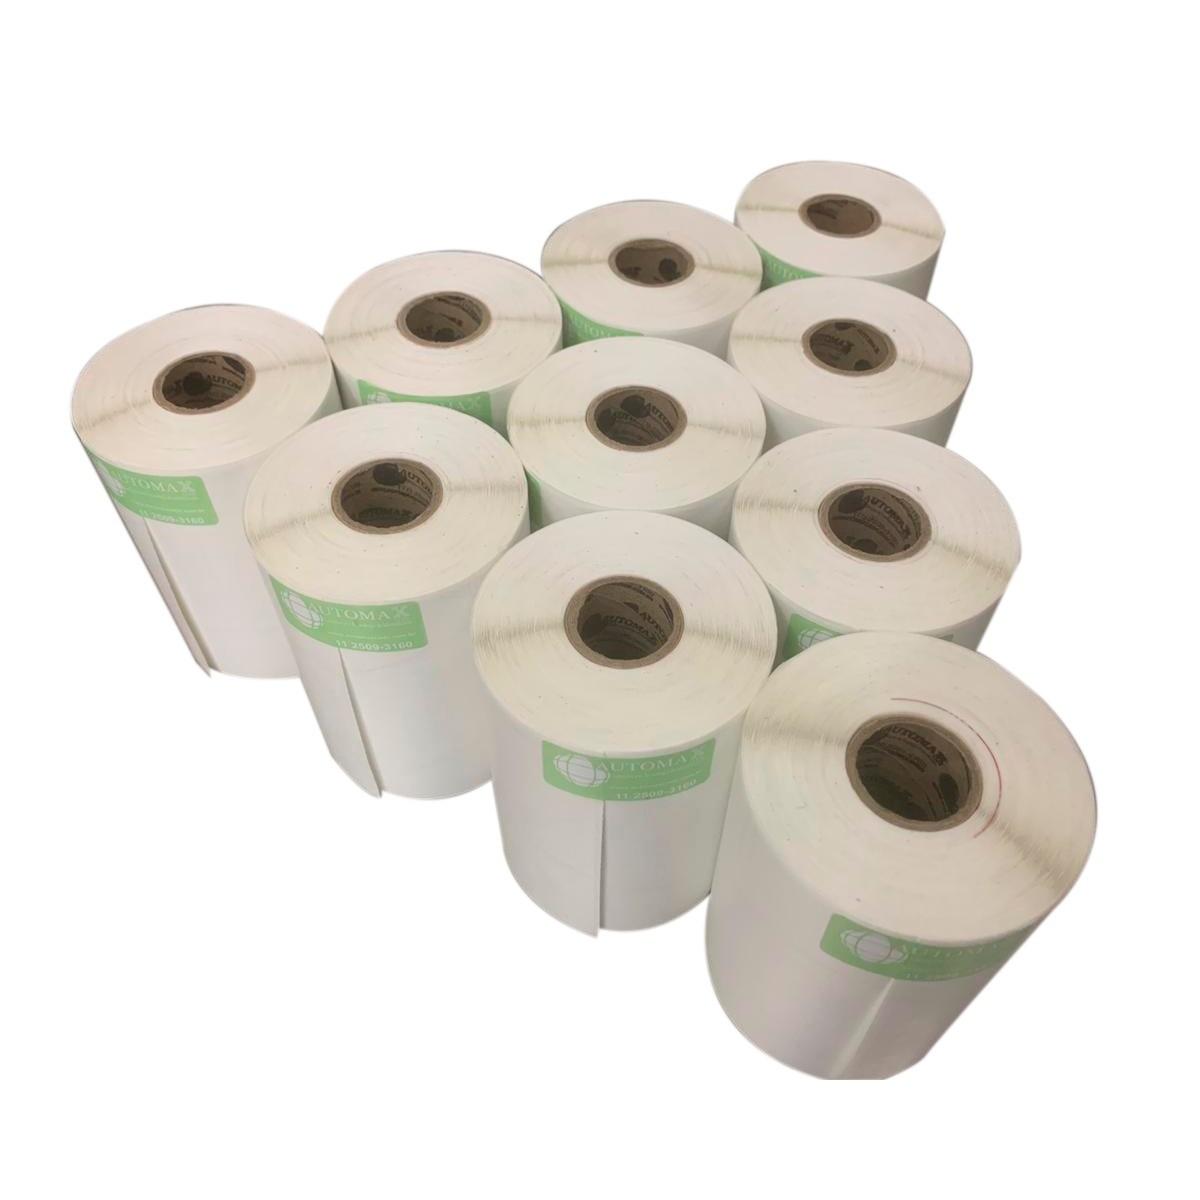 10 Rolos de Etiqueta BOPP 10x5cm | 100mmX50mm